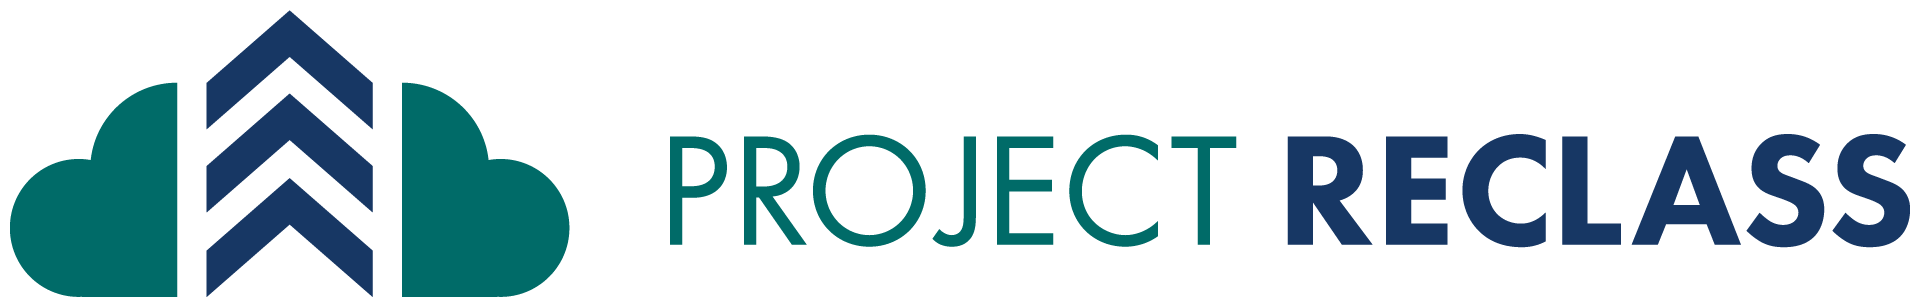 Project Reclass